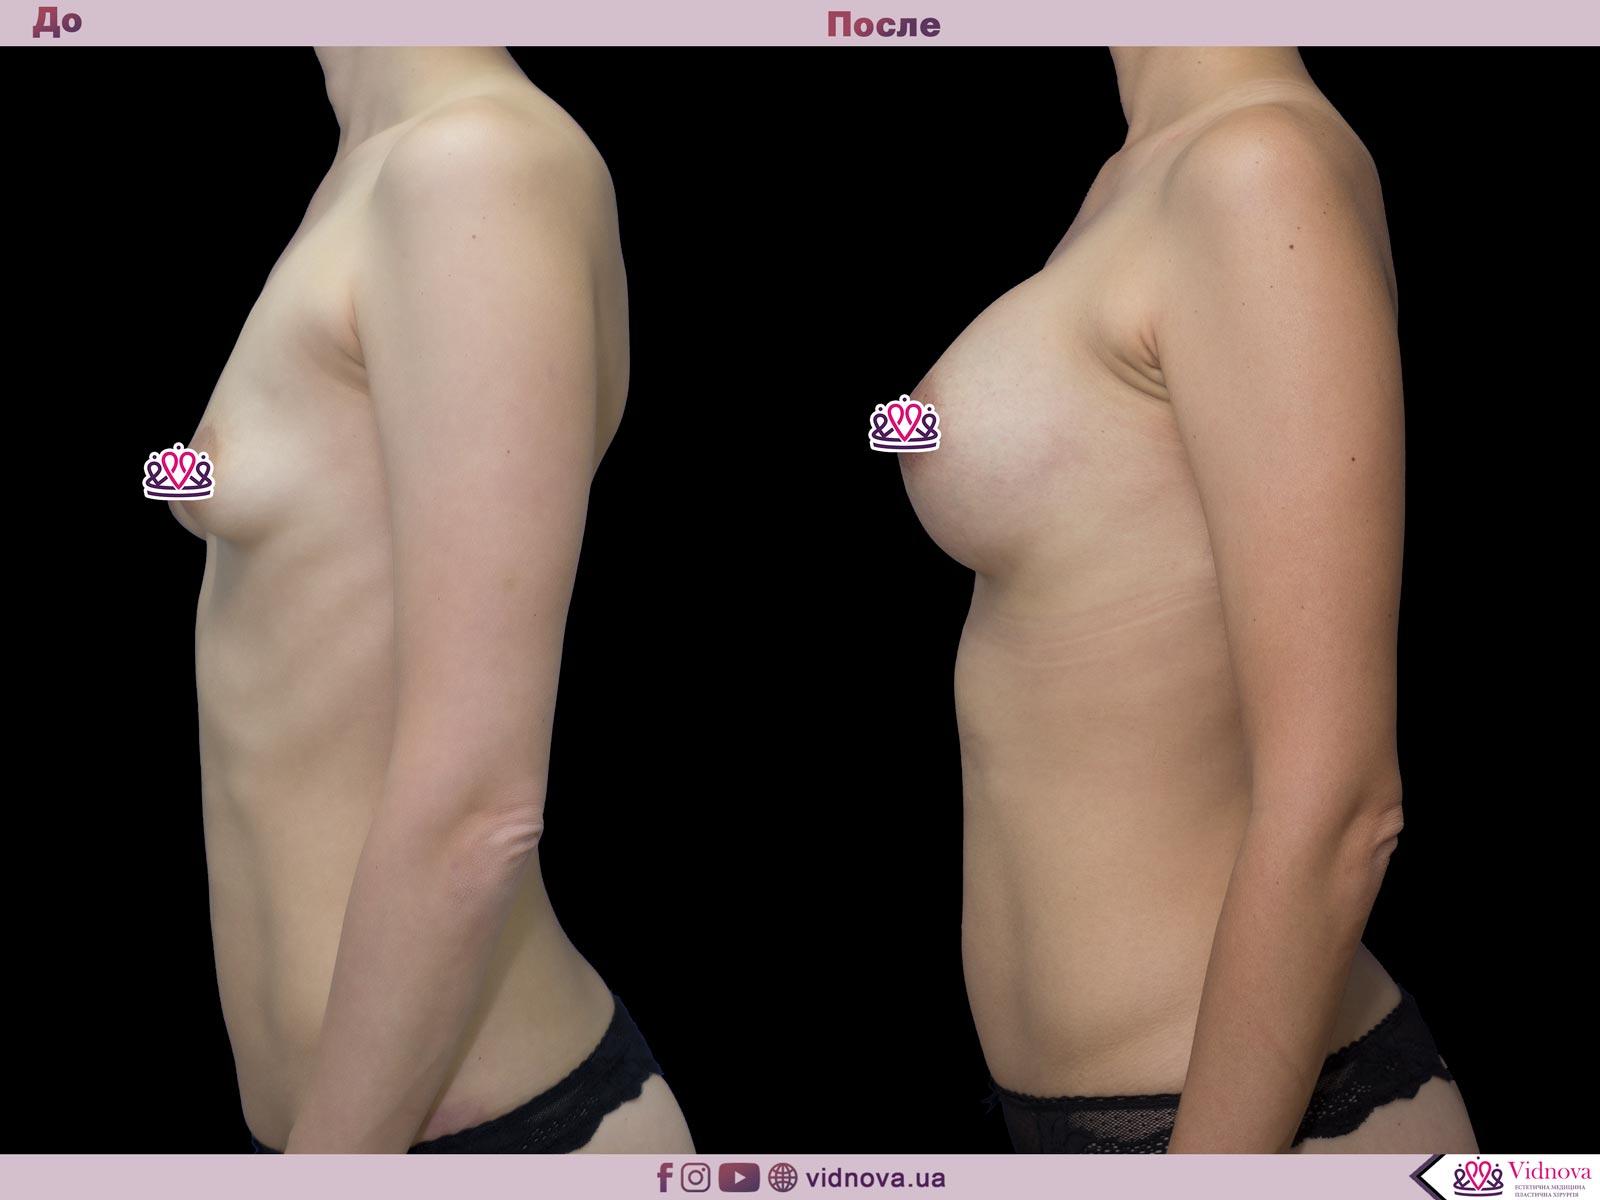 Увеличение груди: Фото ДО и ПОСЛЕ - Пример №52-3 - Клиника Vidnova